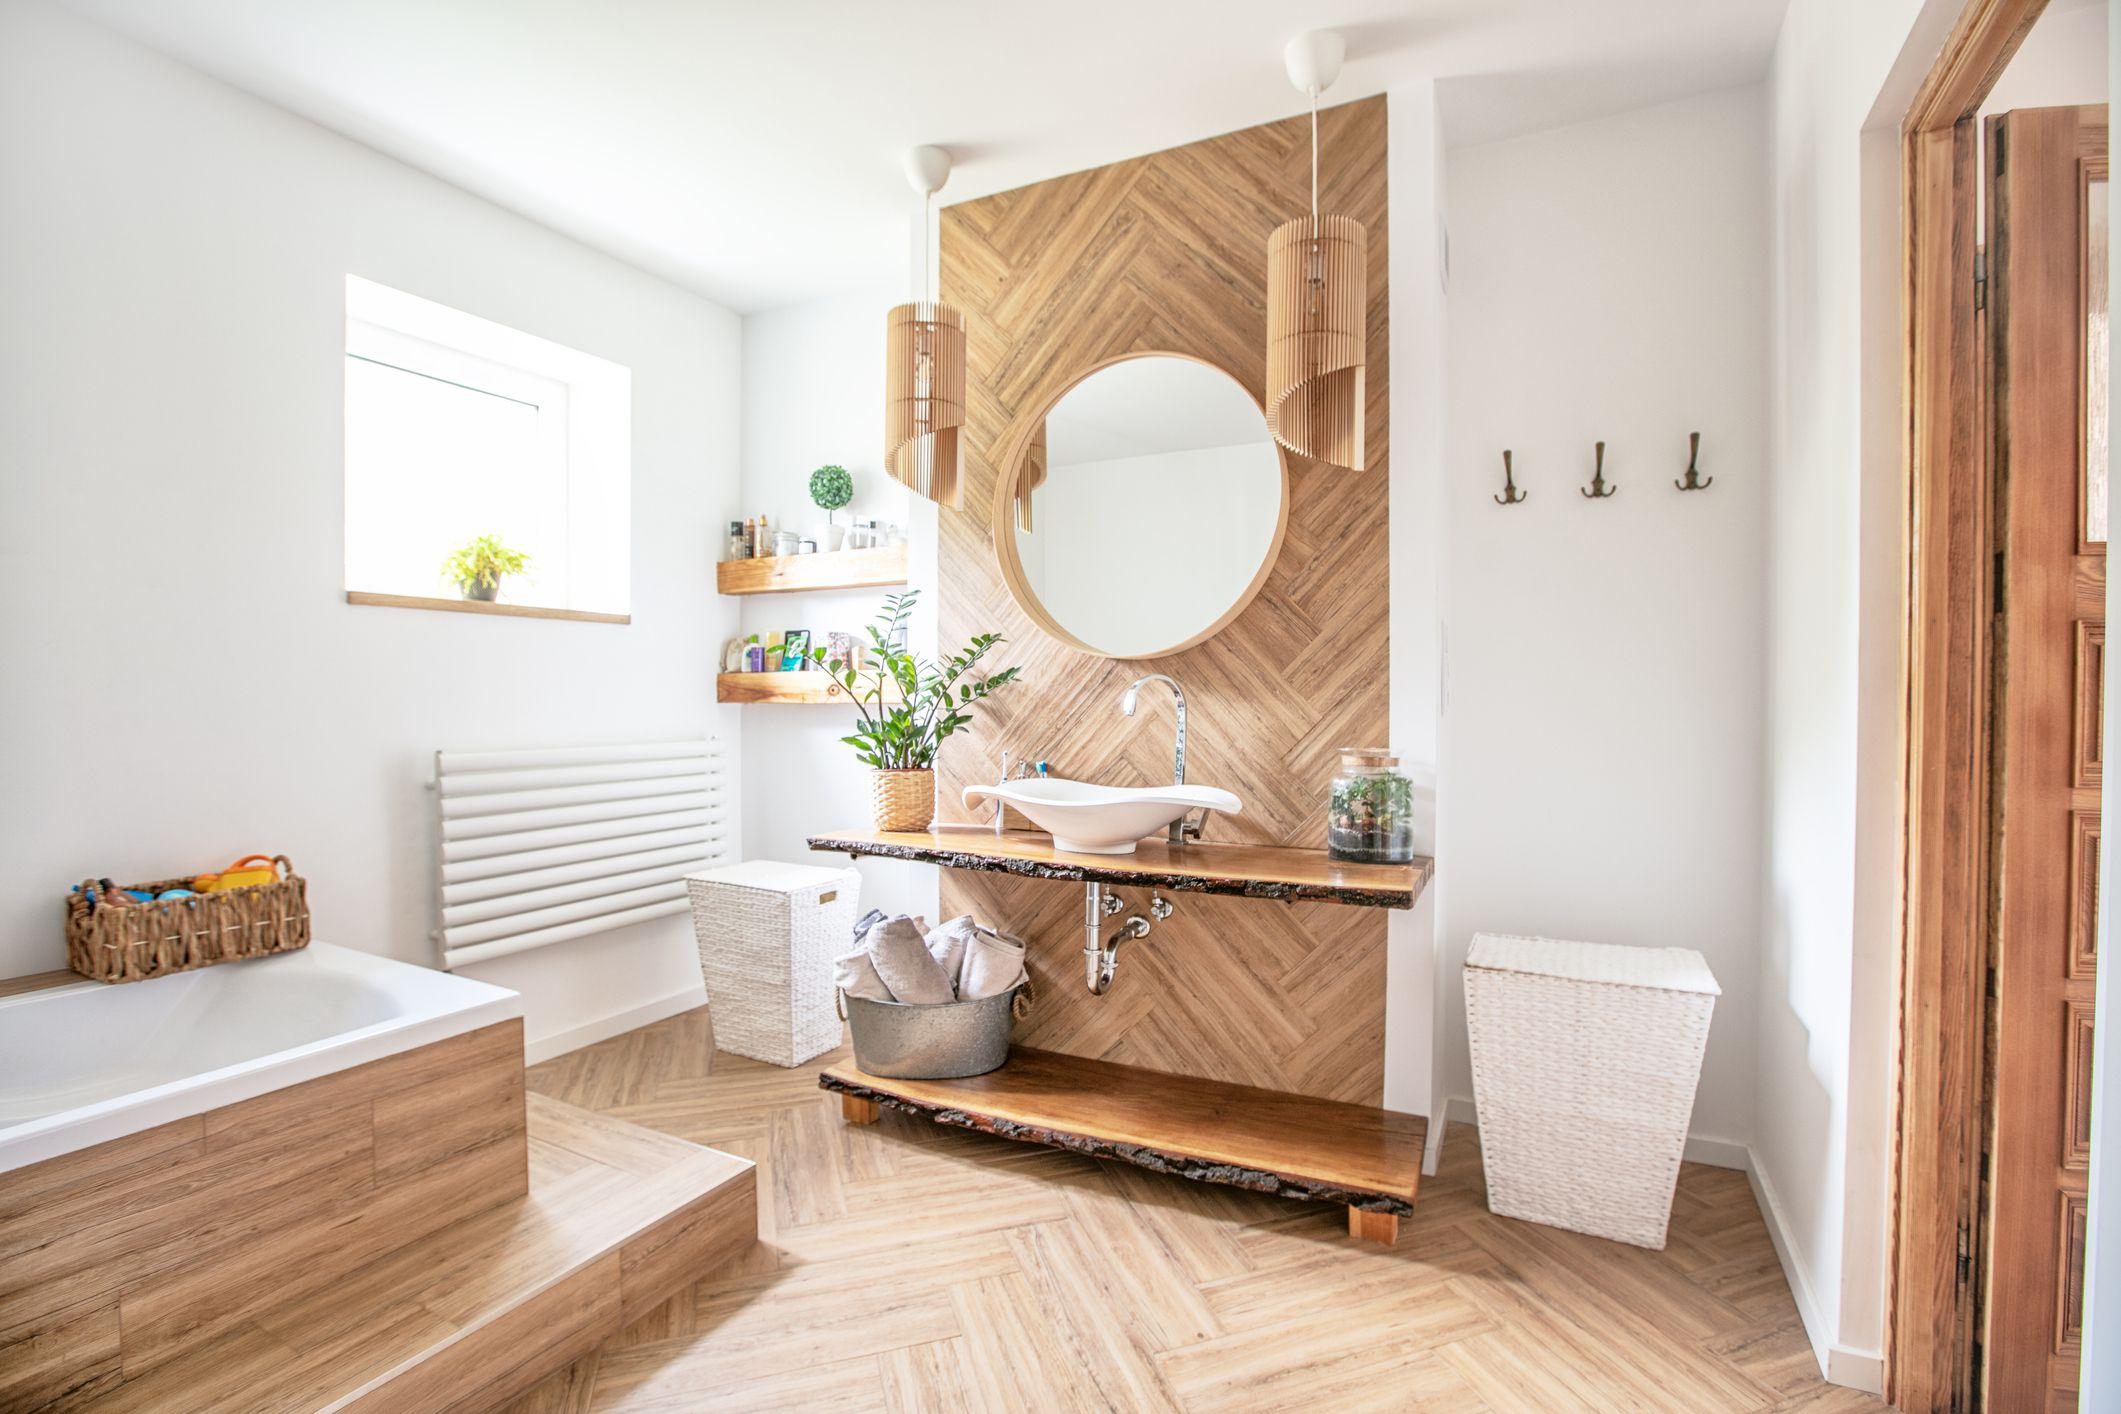 woodenbathroom